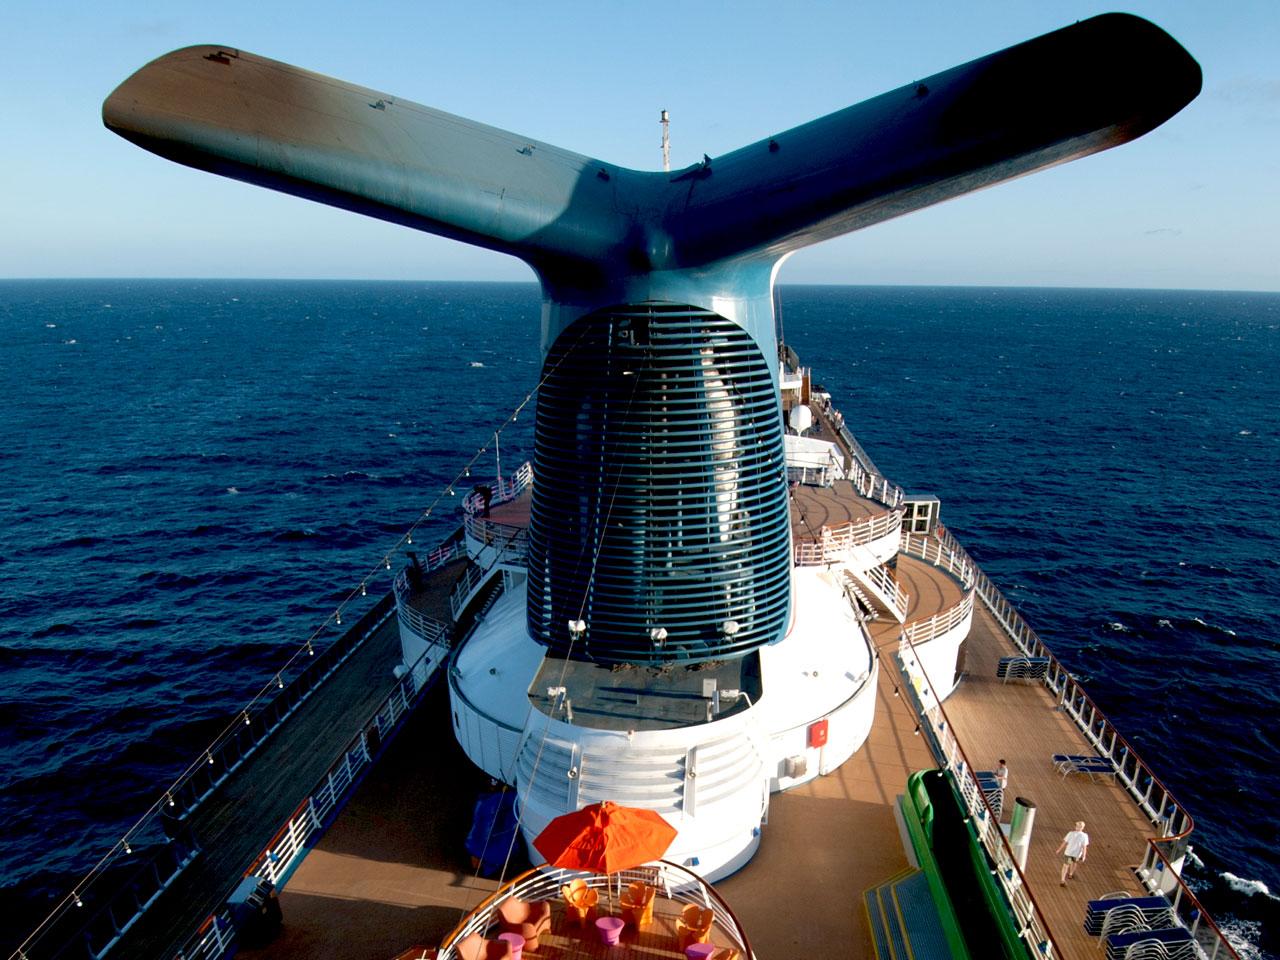 A Guide to Cruising the High Seas